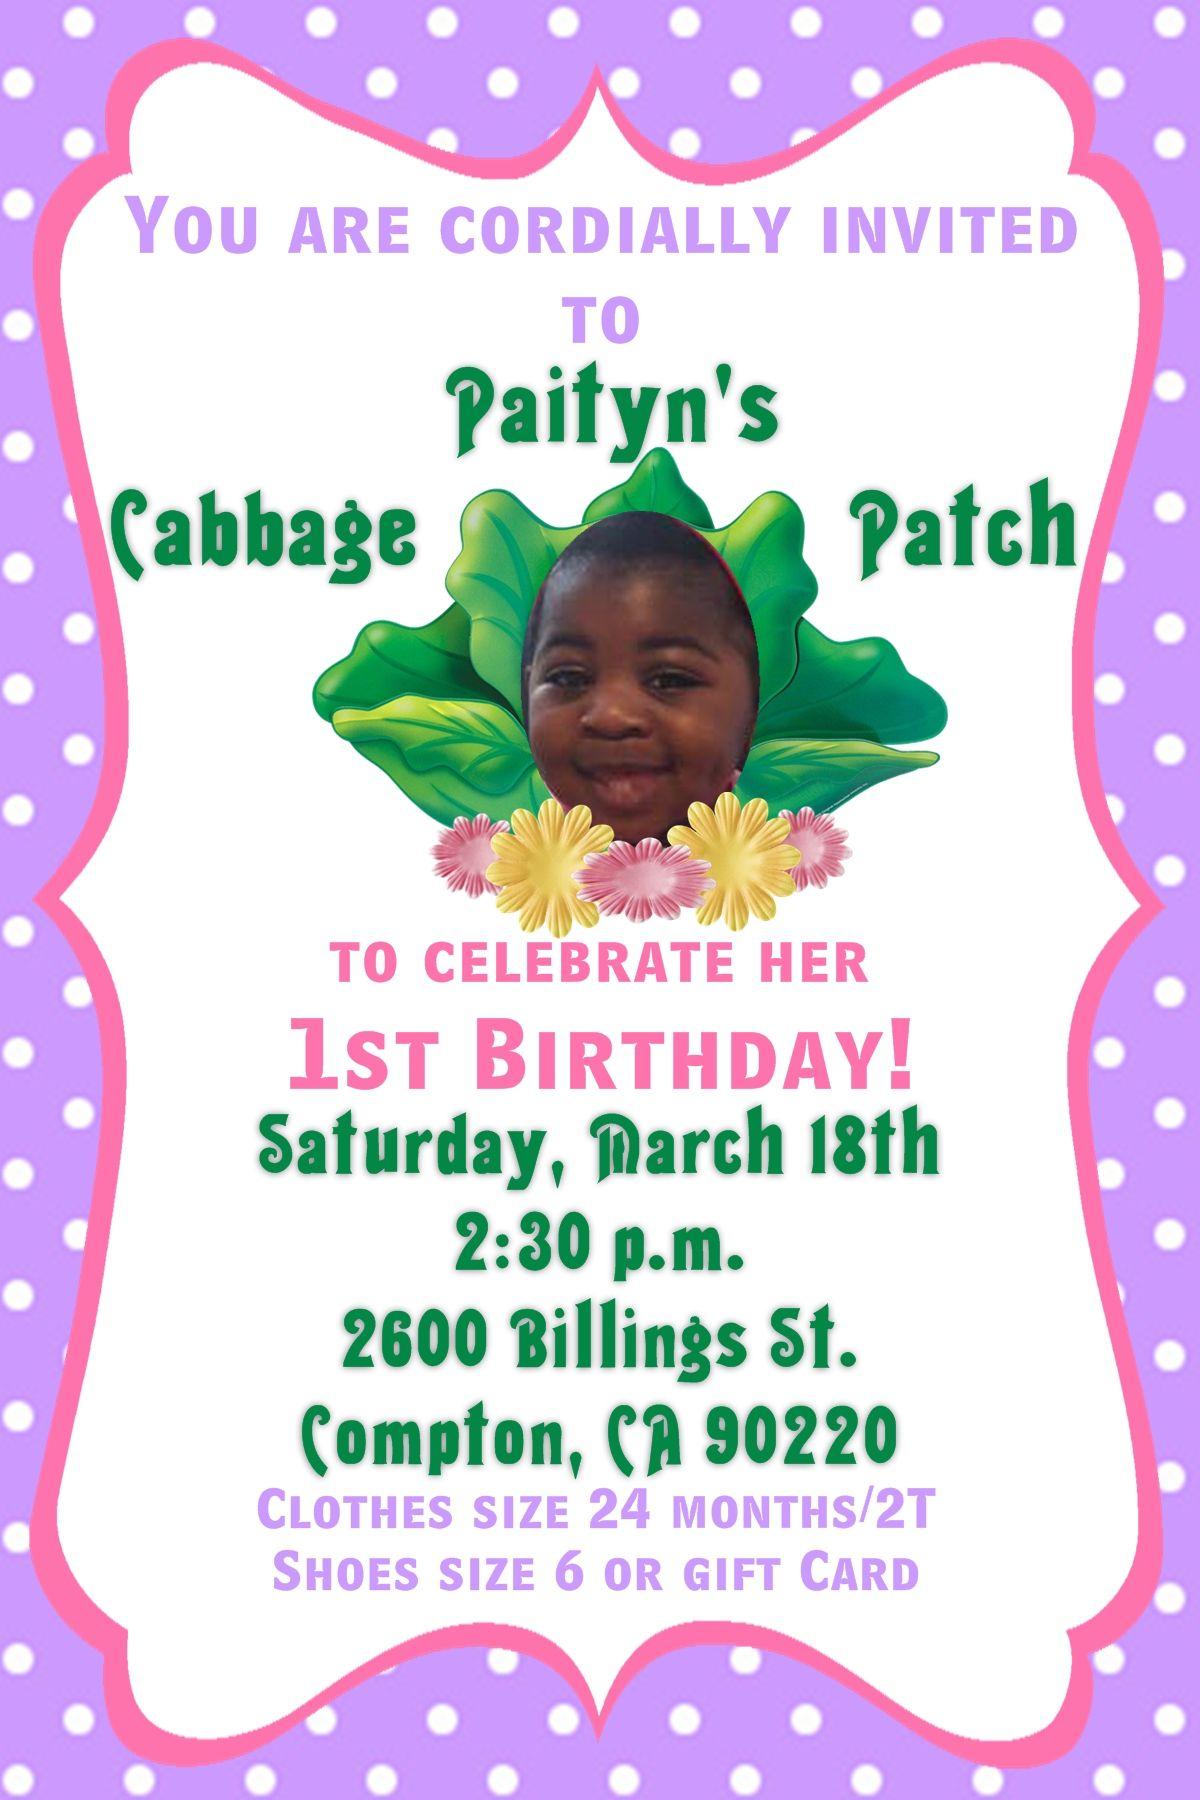 Cabbage Patch Kids Birthday Invitation